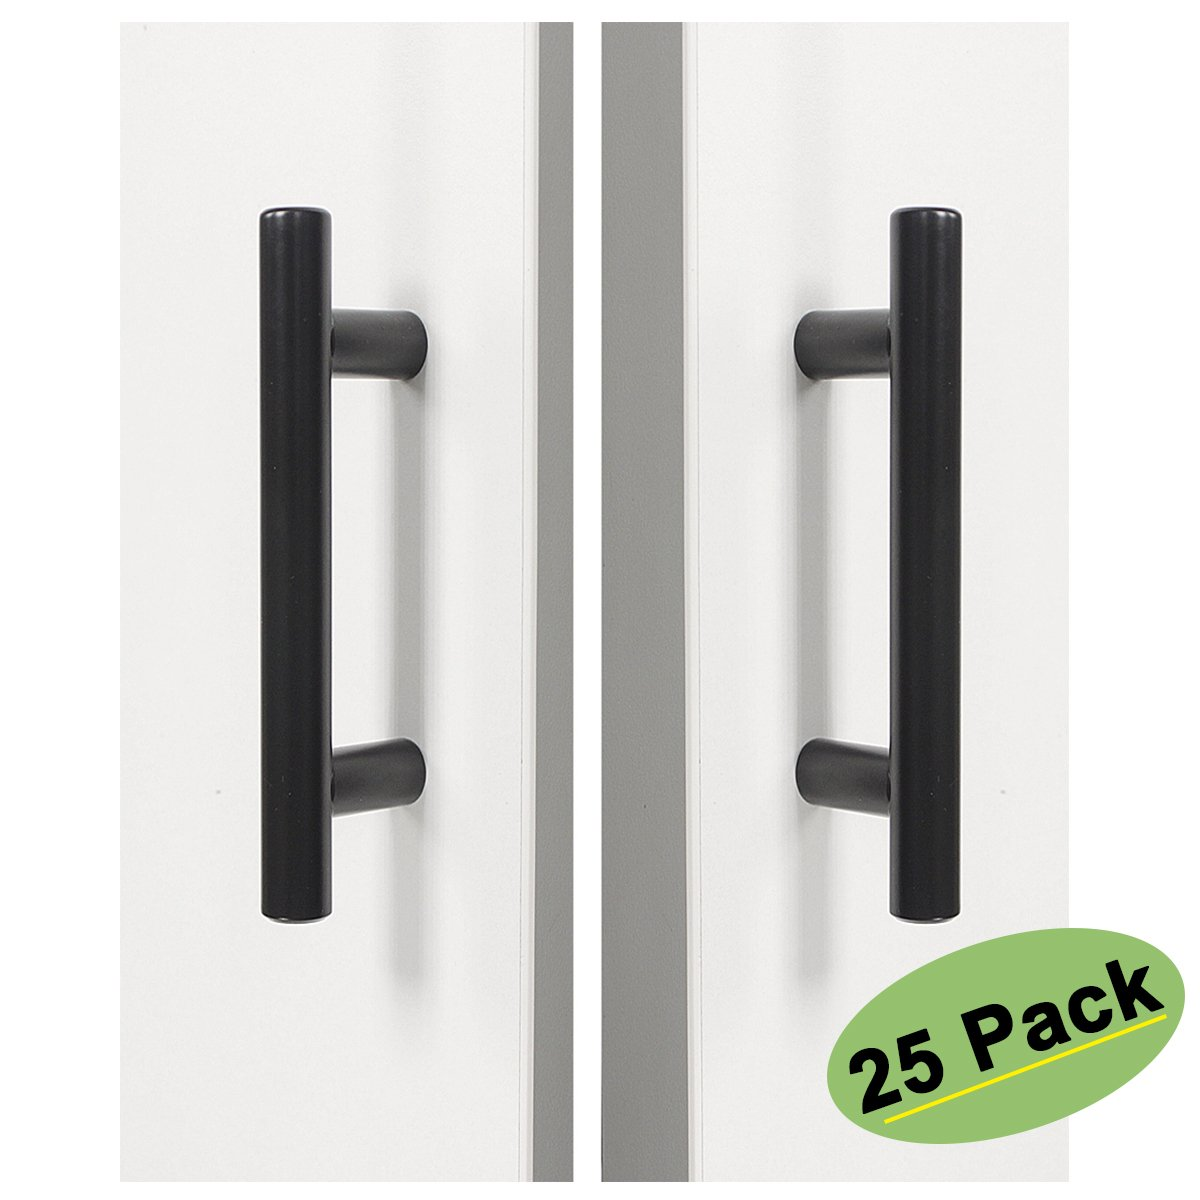 homdiy 3 in Cabinet Handles Black Cabinet Pulls 25 Pack - HD201BK 3in Cabinet Hardware Pulls Black Drawer Pulls and Knobs for Kitchen Furniture, Bathroom, Wardrobe, Closet